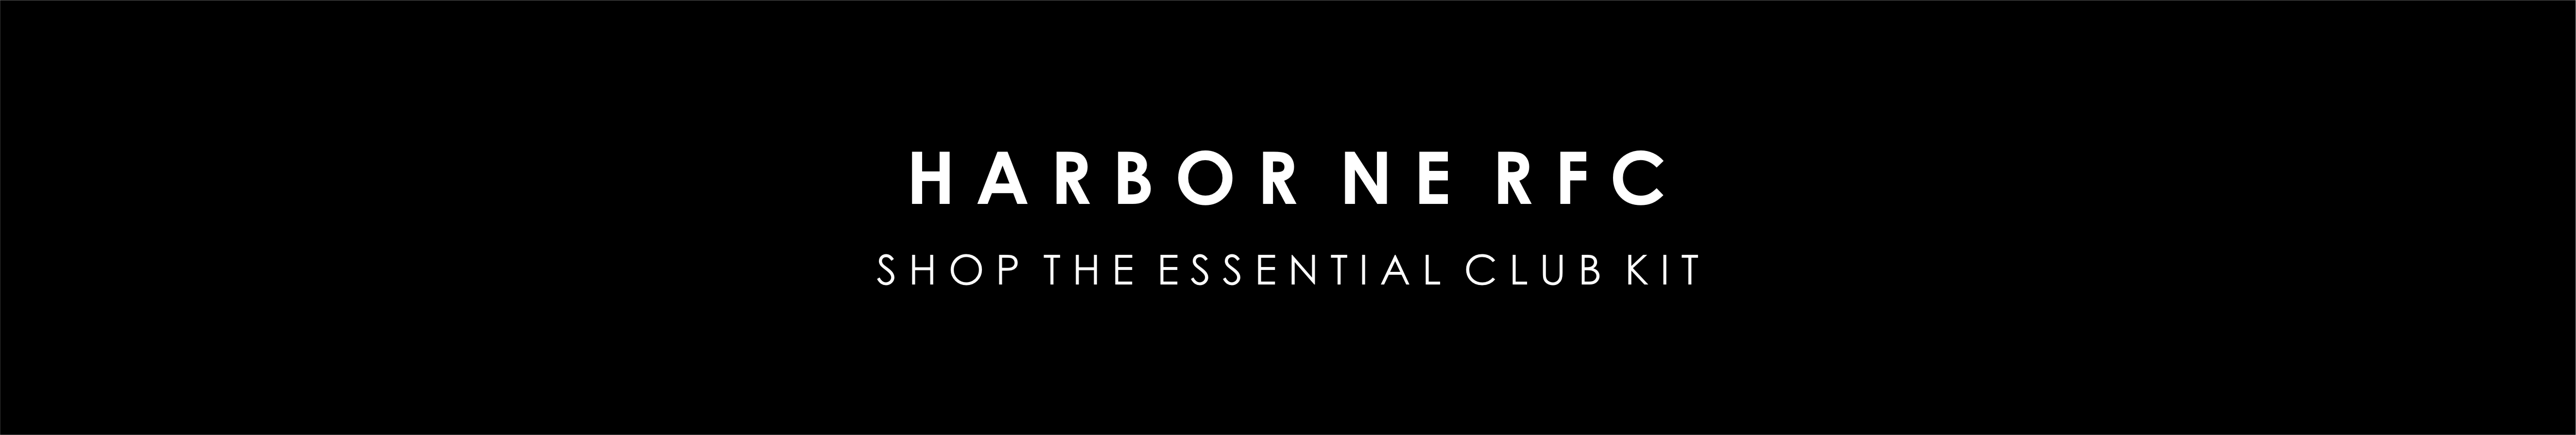 harborne-rfc-banner.jpg